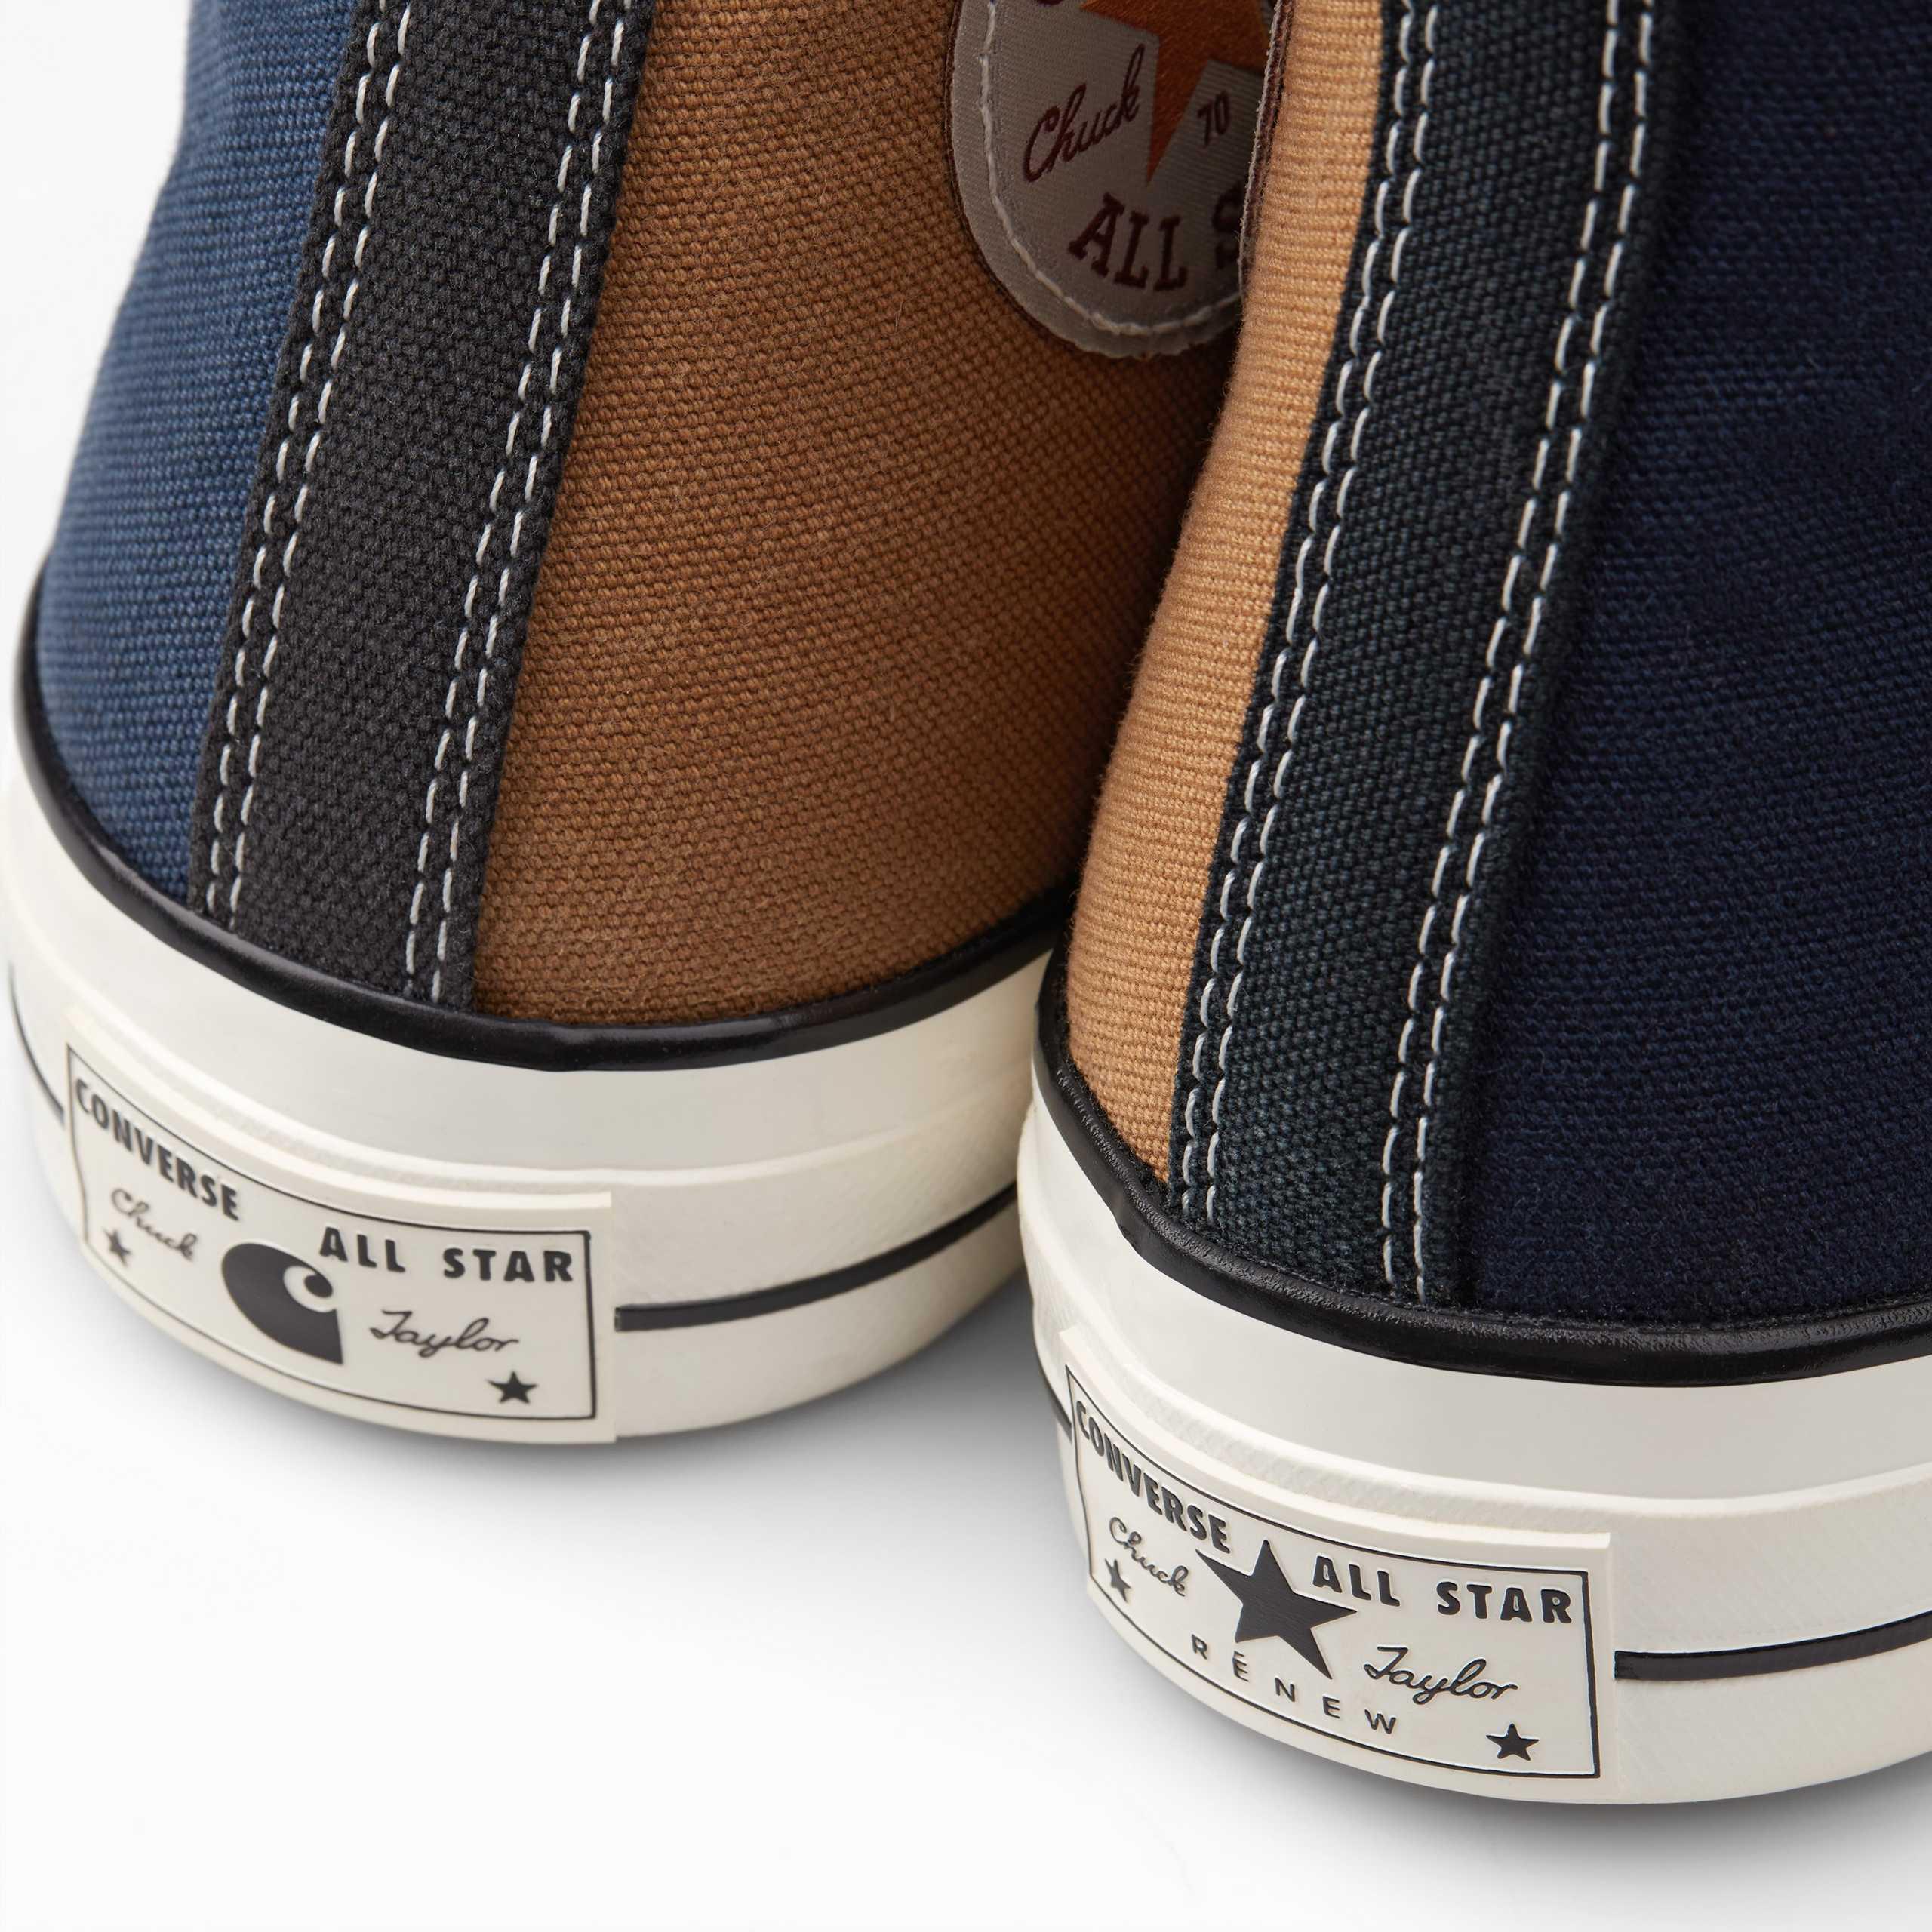 Ciro Favor Ocurrencia  Carhartt WIP x Converse Chuck 70 ''Renew'' - 168156C - Sneaker Style